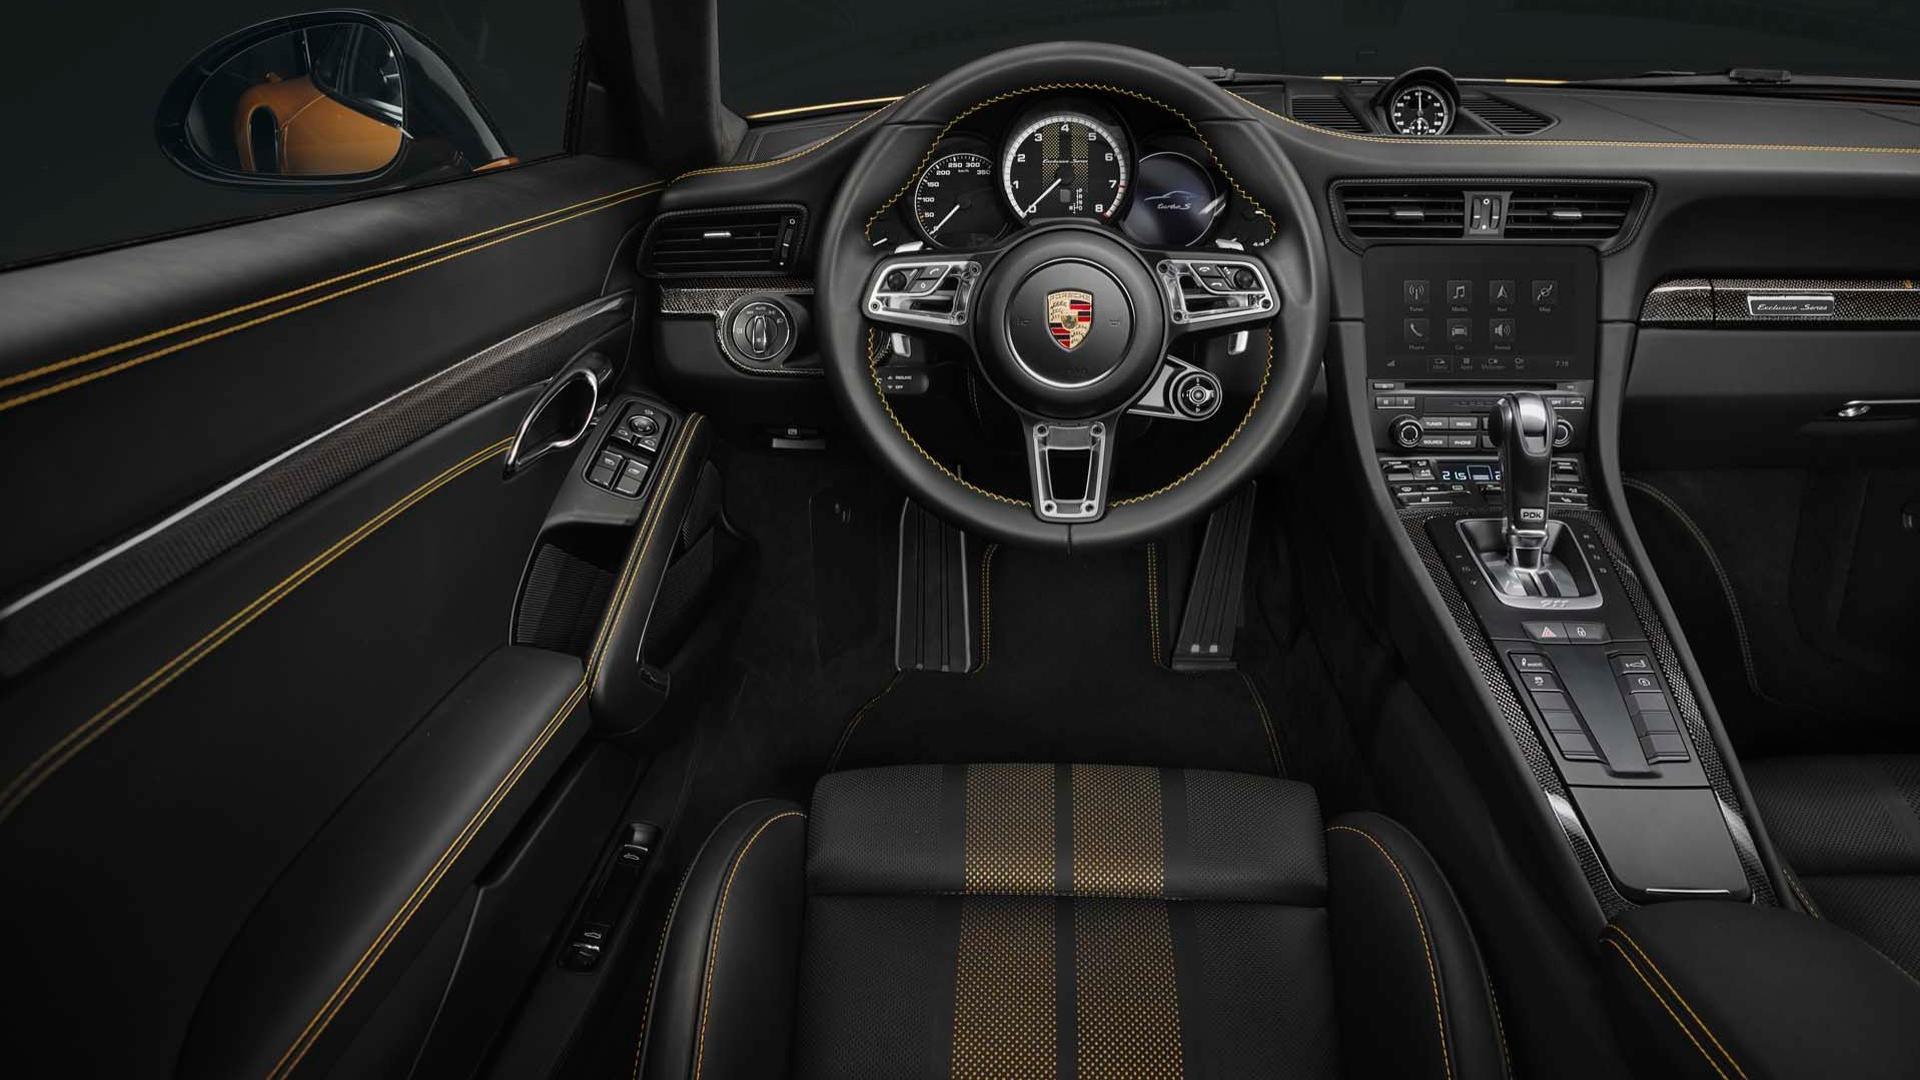 Porsche показала самую мощную версию 911 Turbo S 2